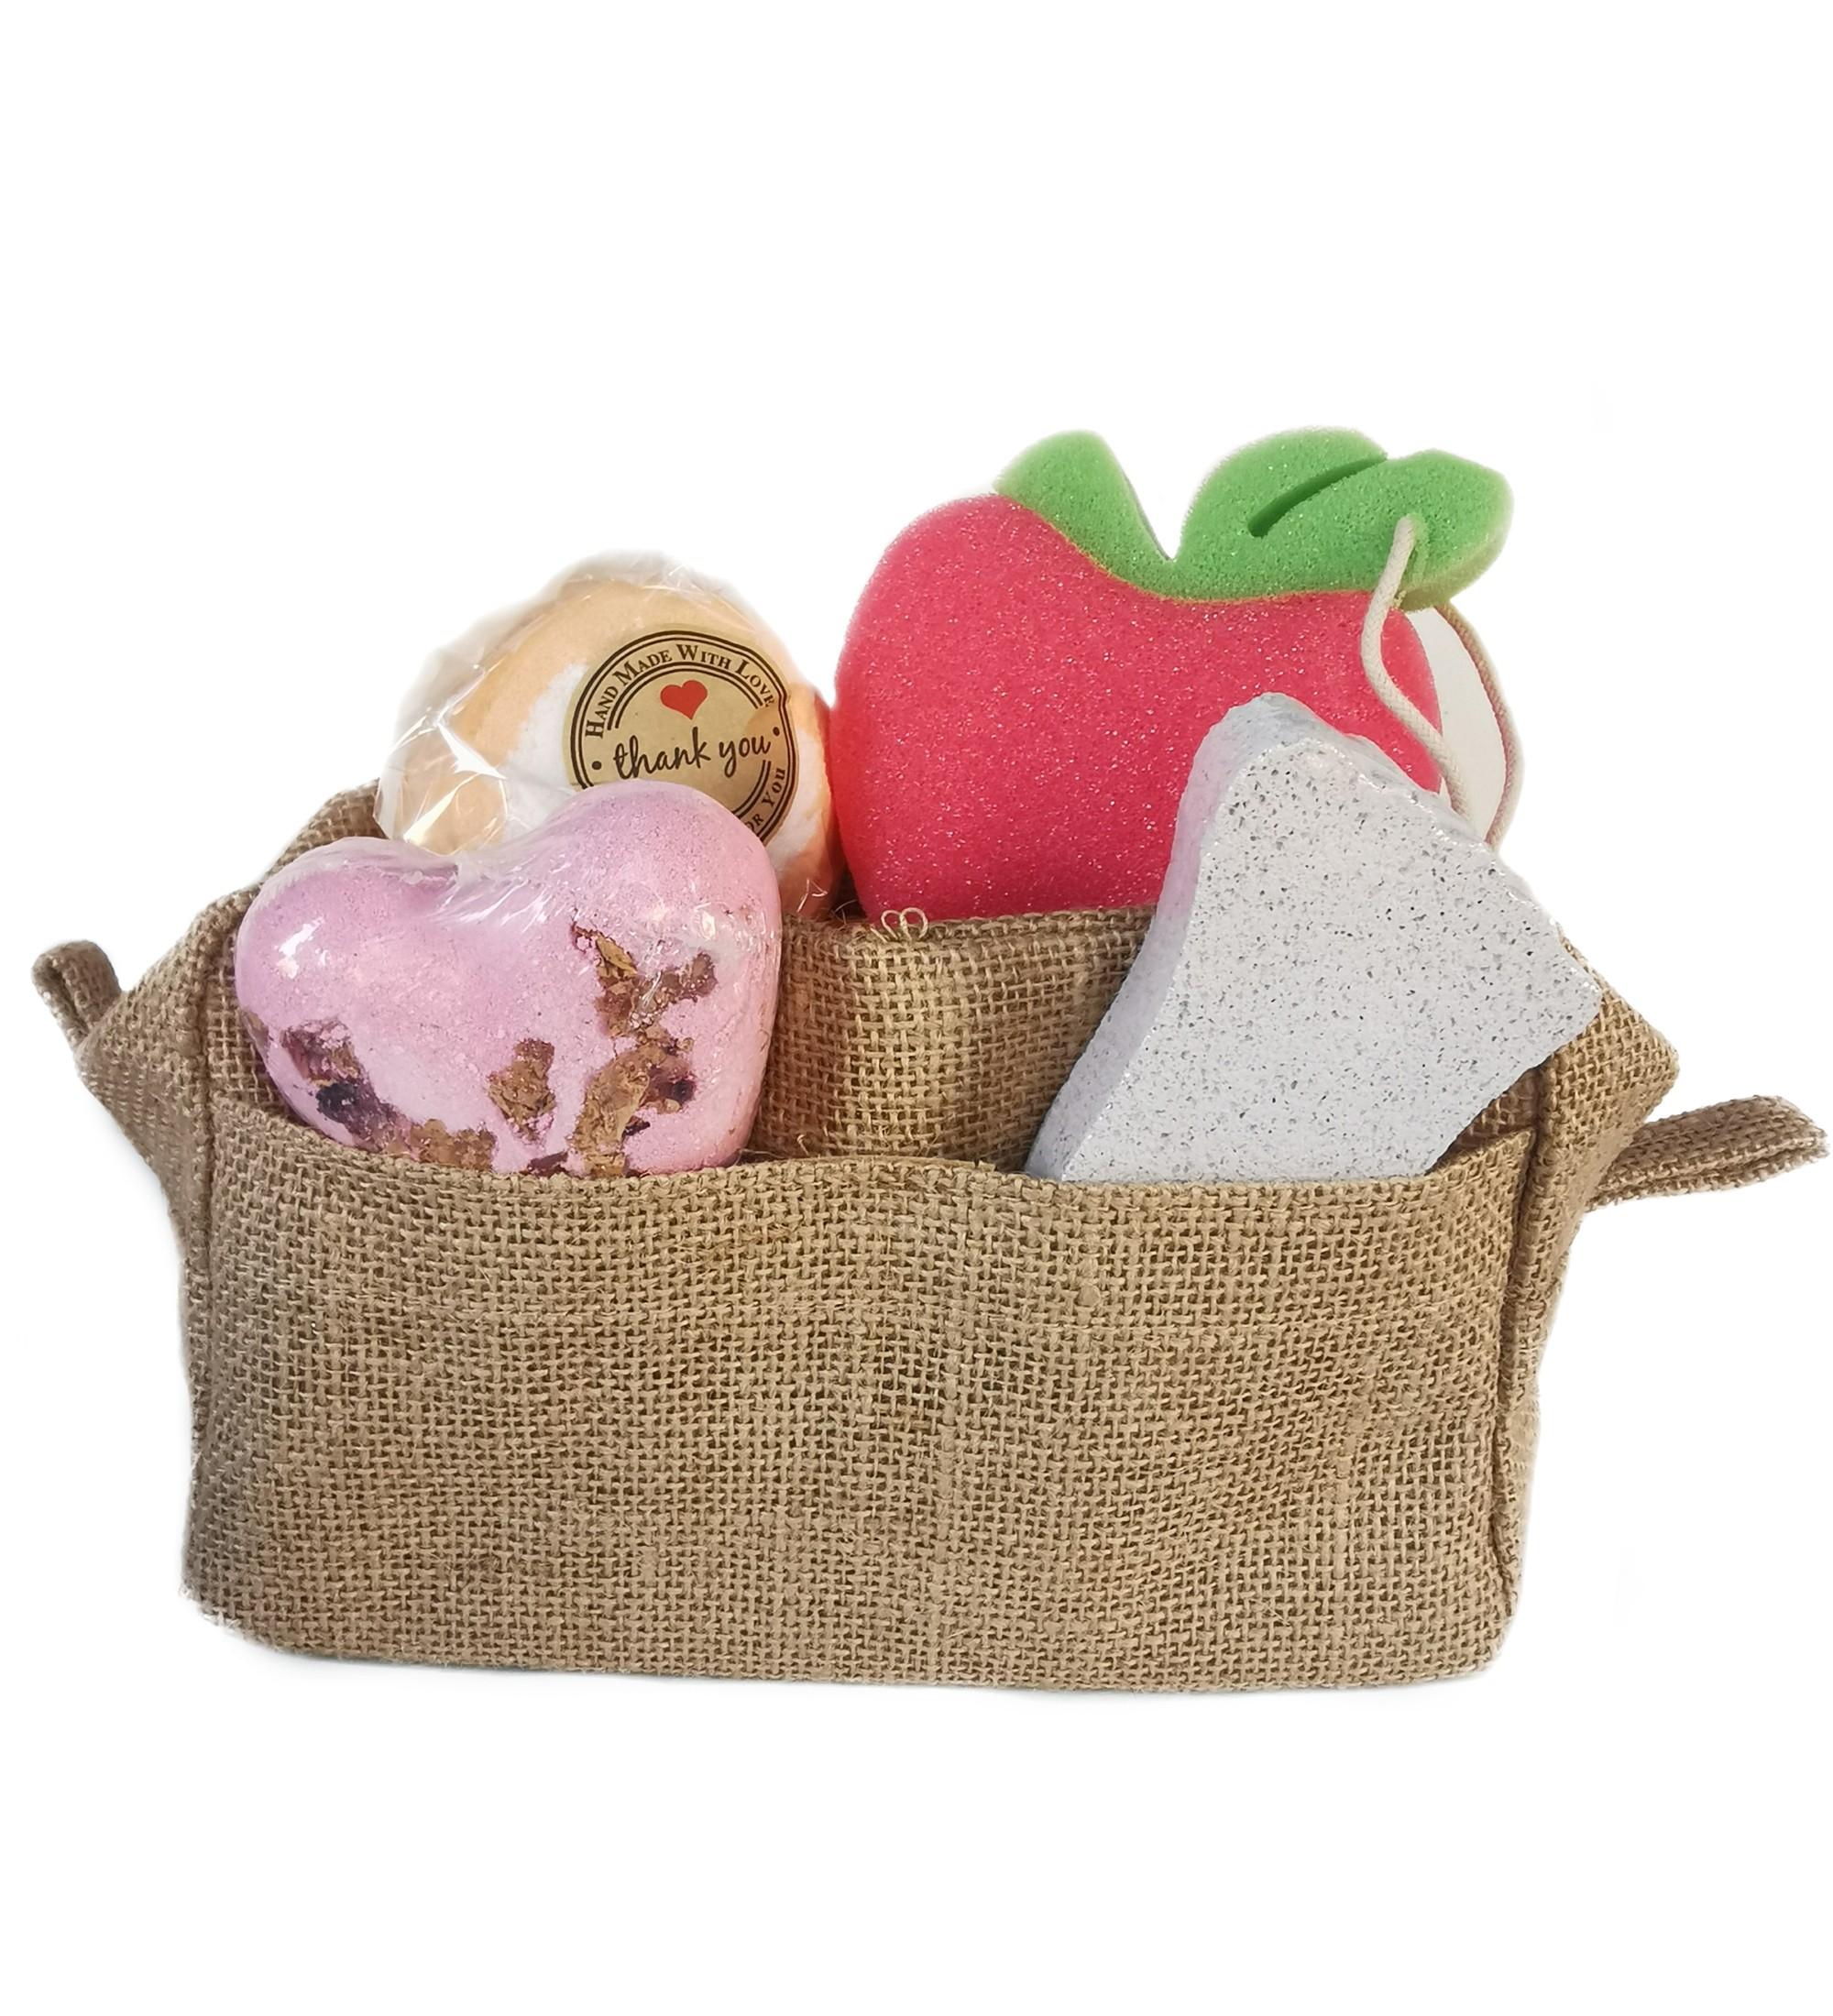 Bath Treat Gift Set